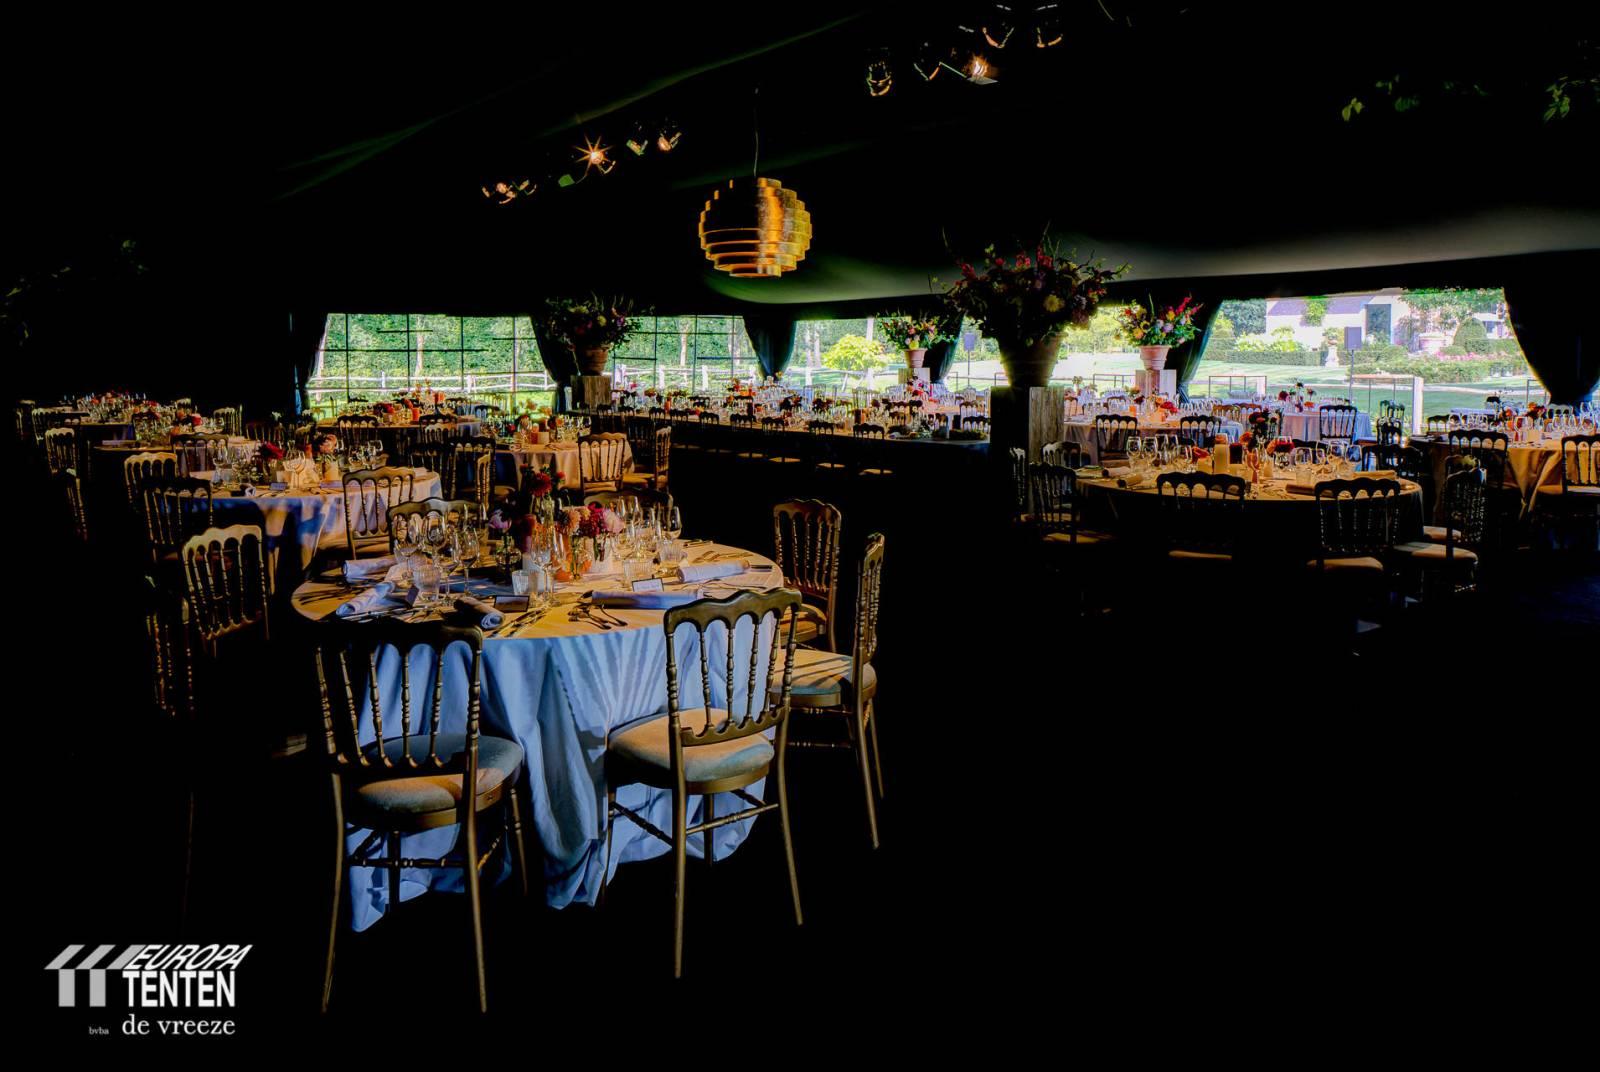 Europatenten 2 - House of Weddings-19